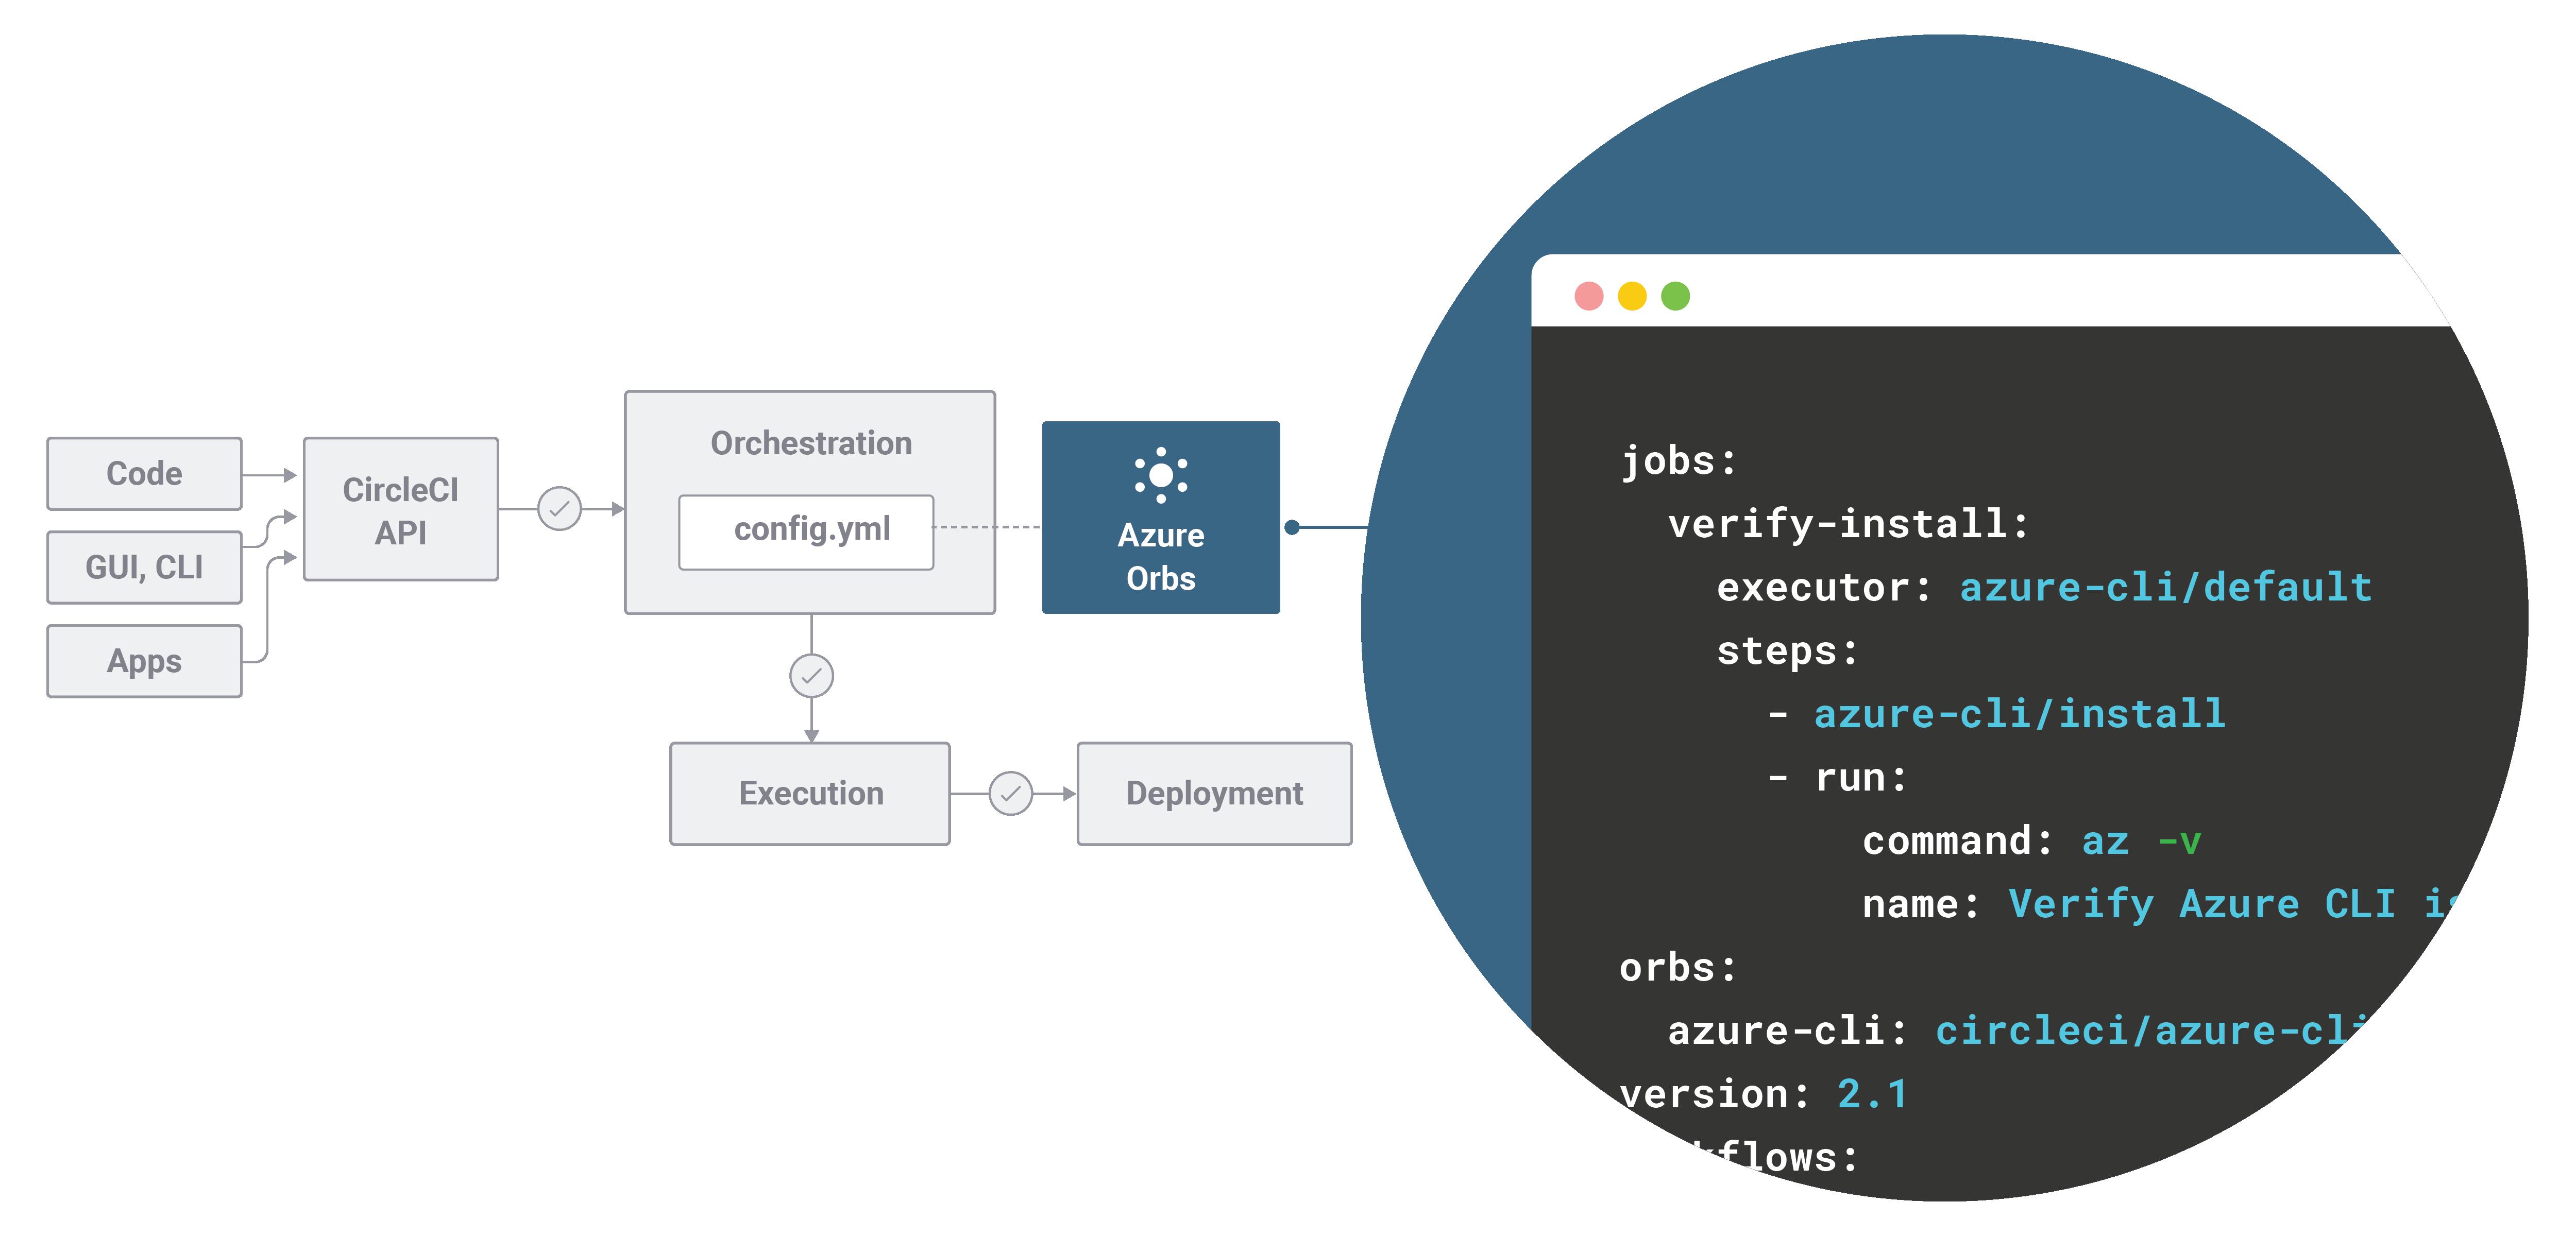 CircleCI パイプライン内で Azure 用 Orb を使用する config.yml ファイルの図